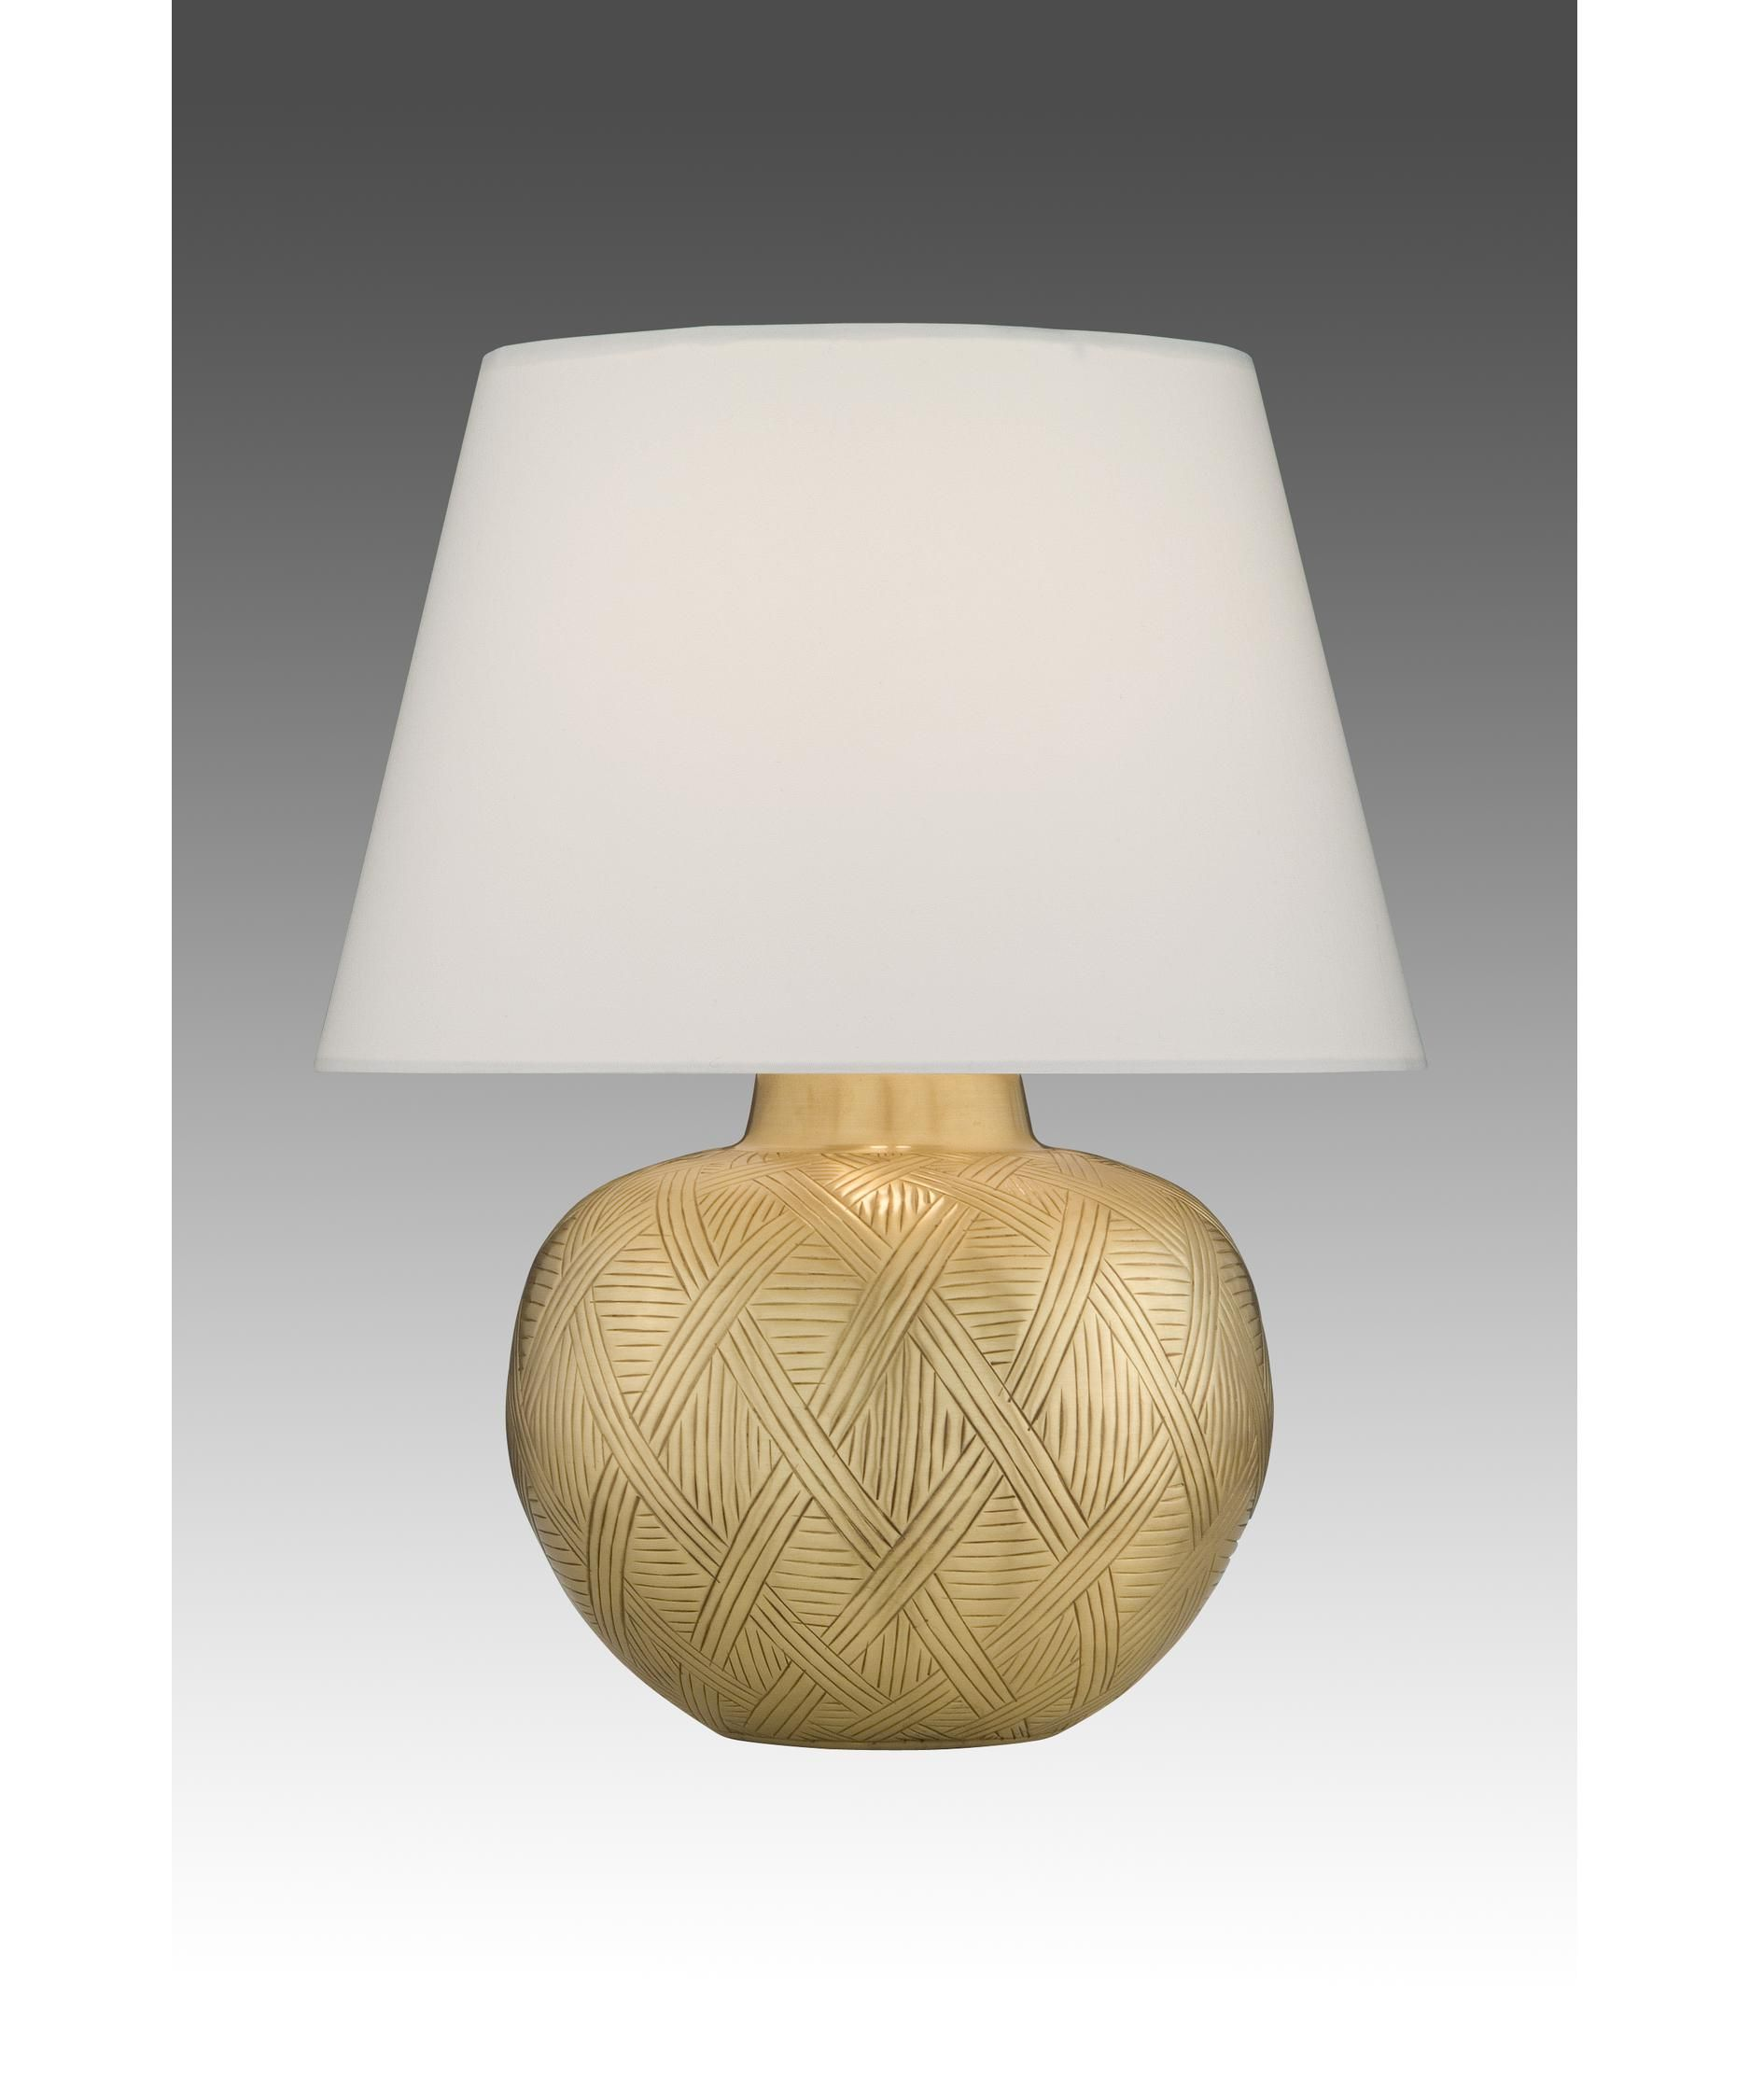 Remington Lamp 2276 22 Inch High Table Lamp